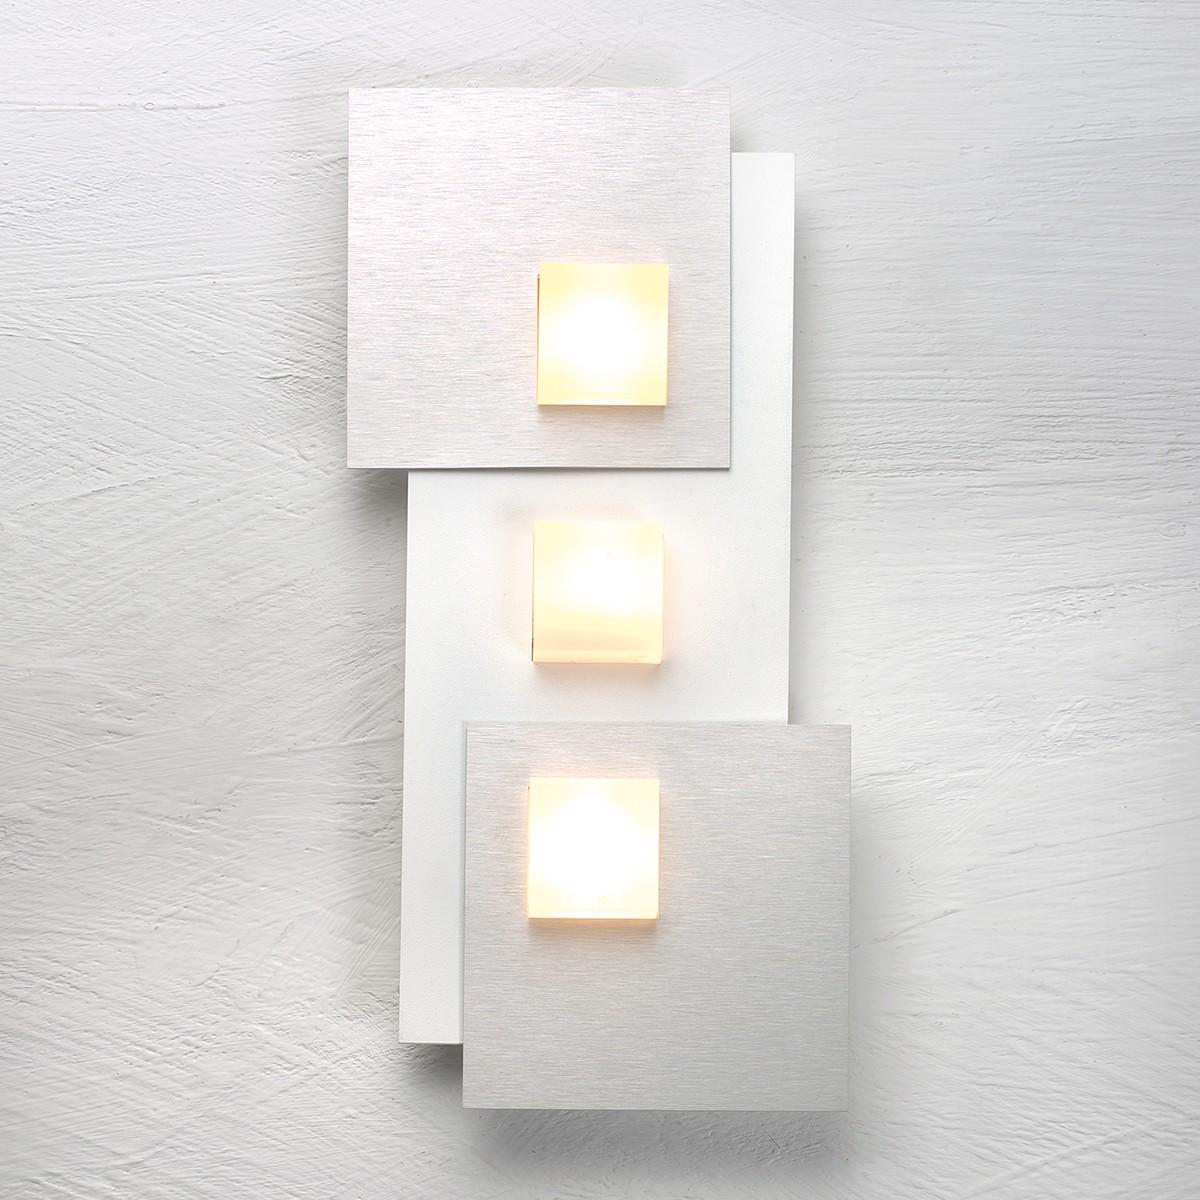 Bopp Pixel 2.0 LED Deckenleuchte 3-flg., weiß, Dekoplatte: Aluminium